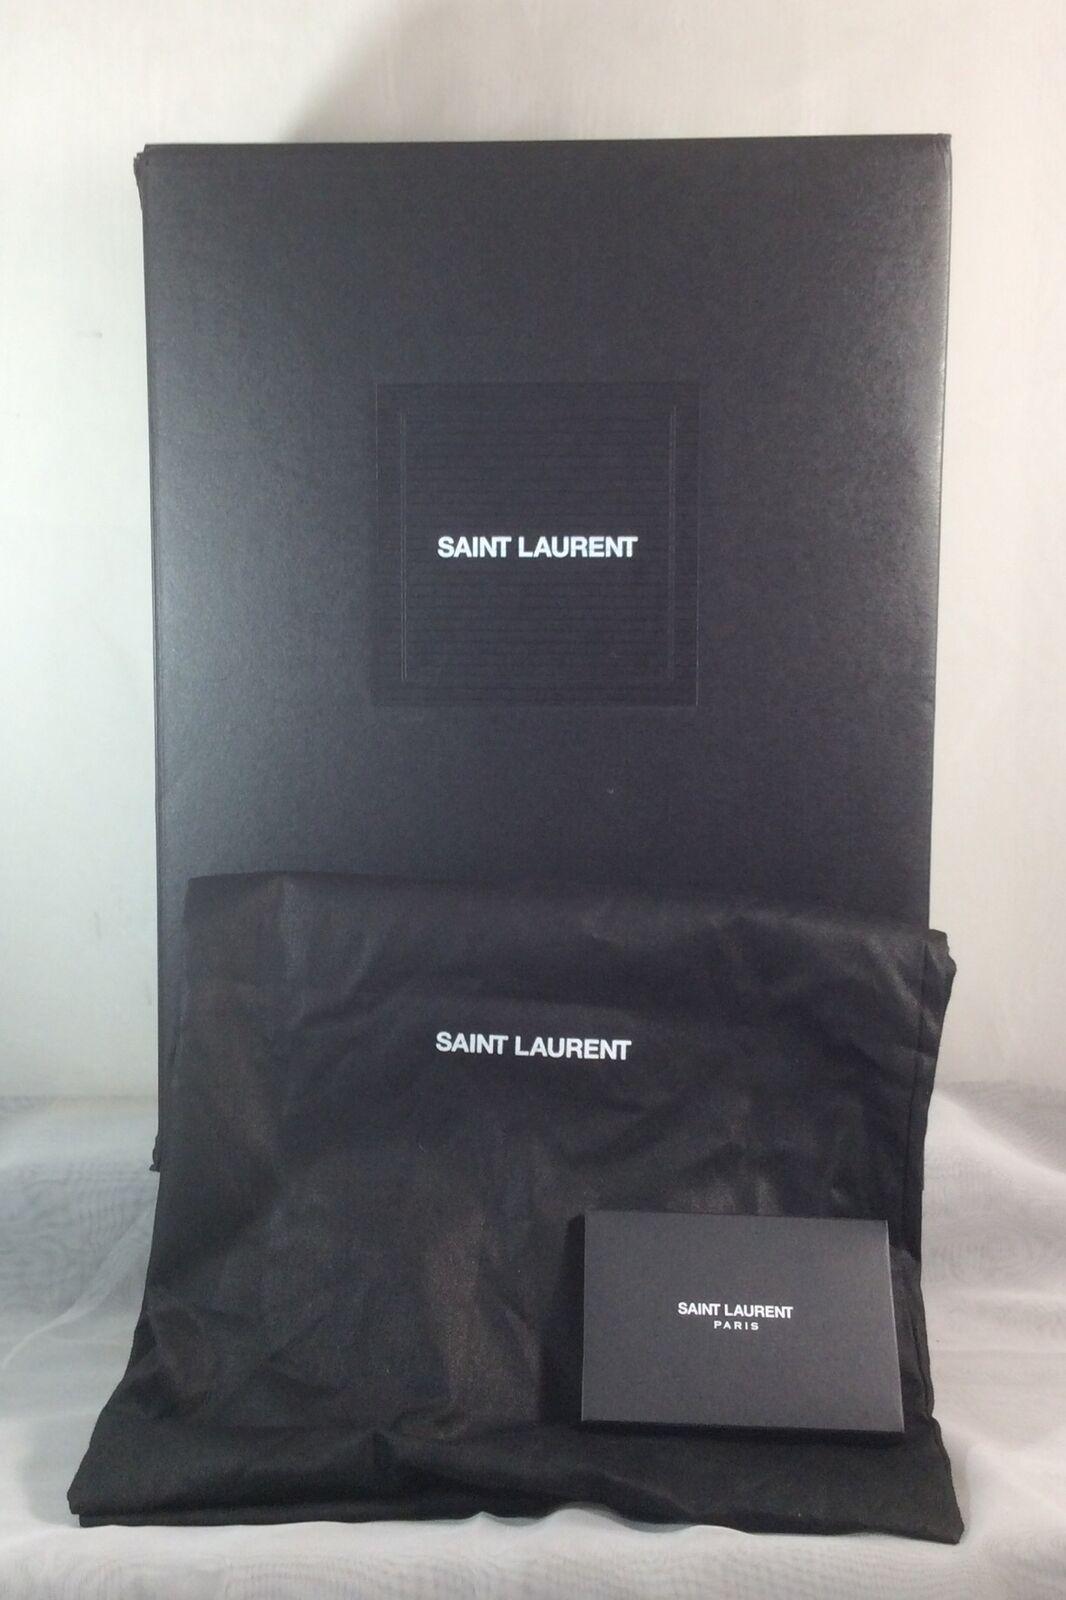 "YSL Saint Laurent Shoe Gift Storage Box 10 X 14 X 5 1/4"" Black + 2 Dust Bags"